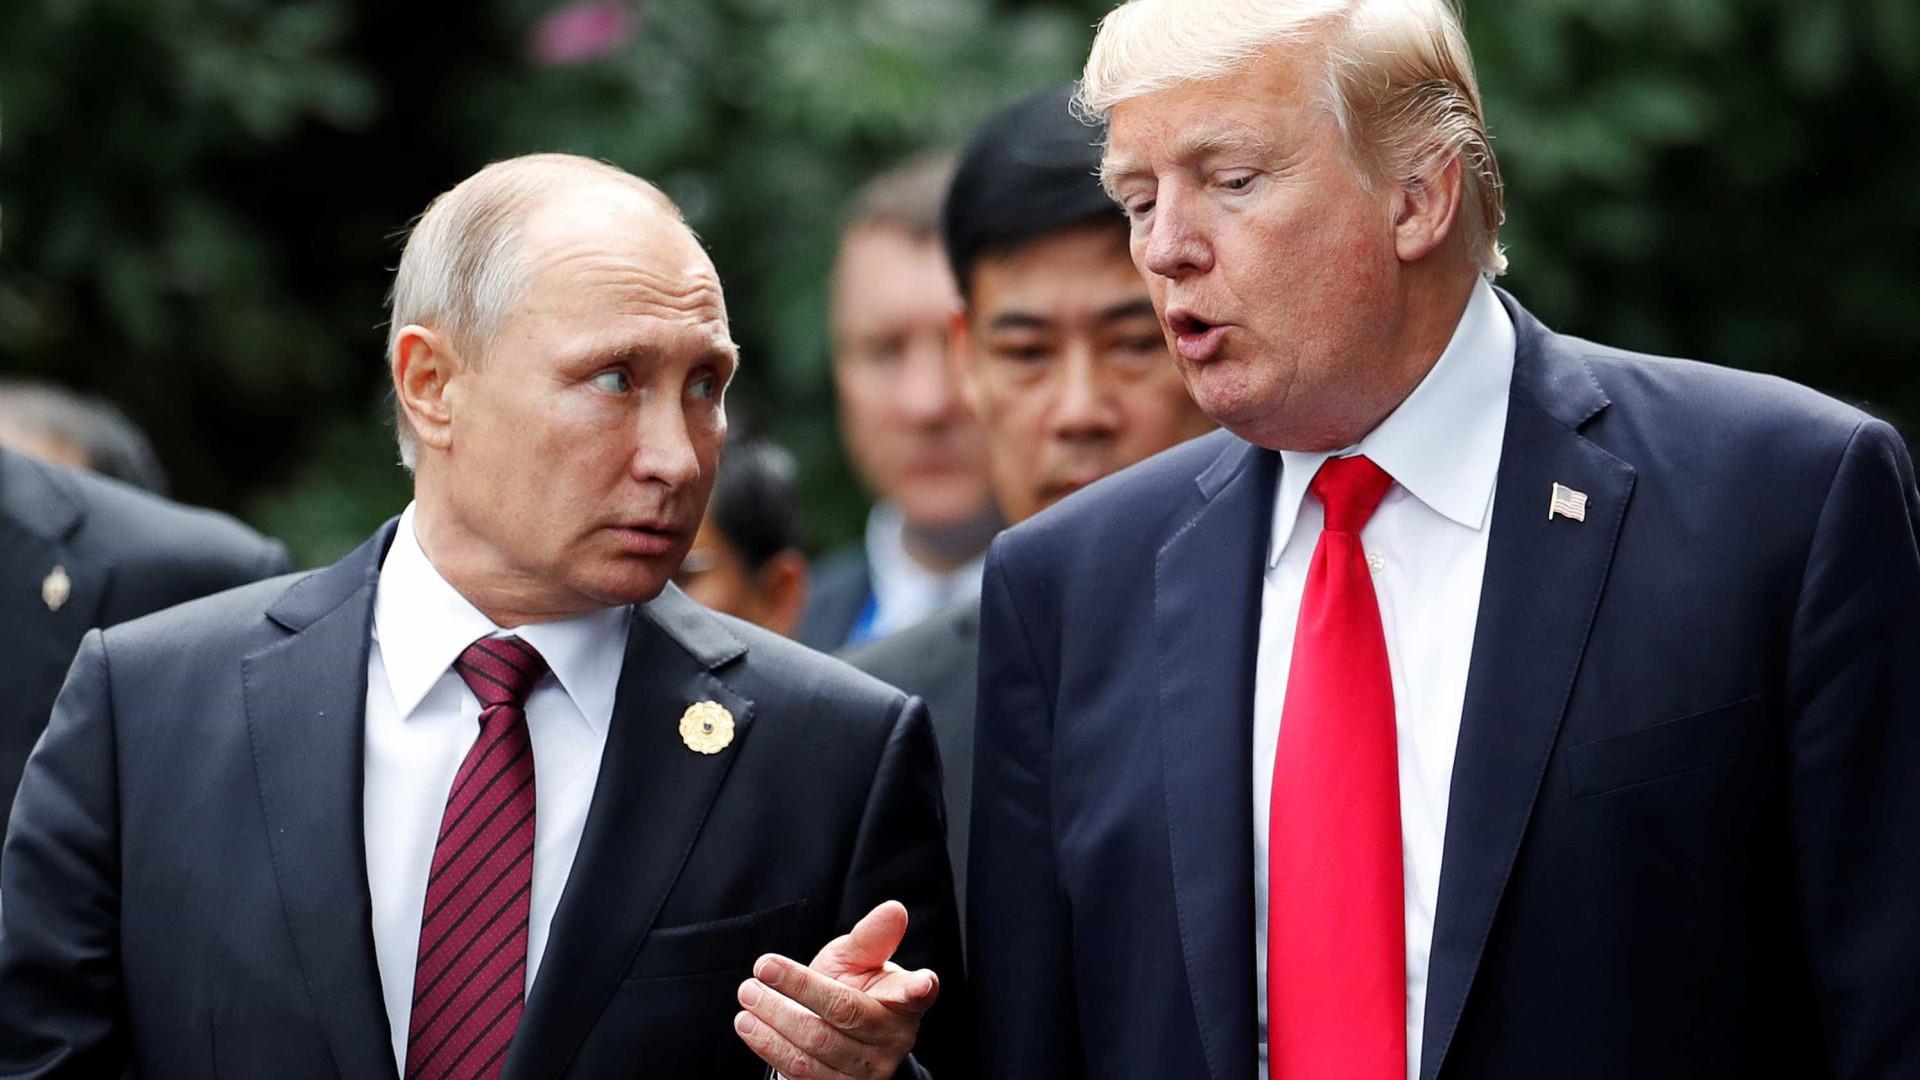 Trump ordena ao Pentágono que prepare saída de tropas da Síria